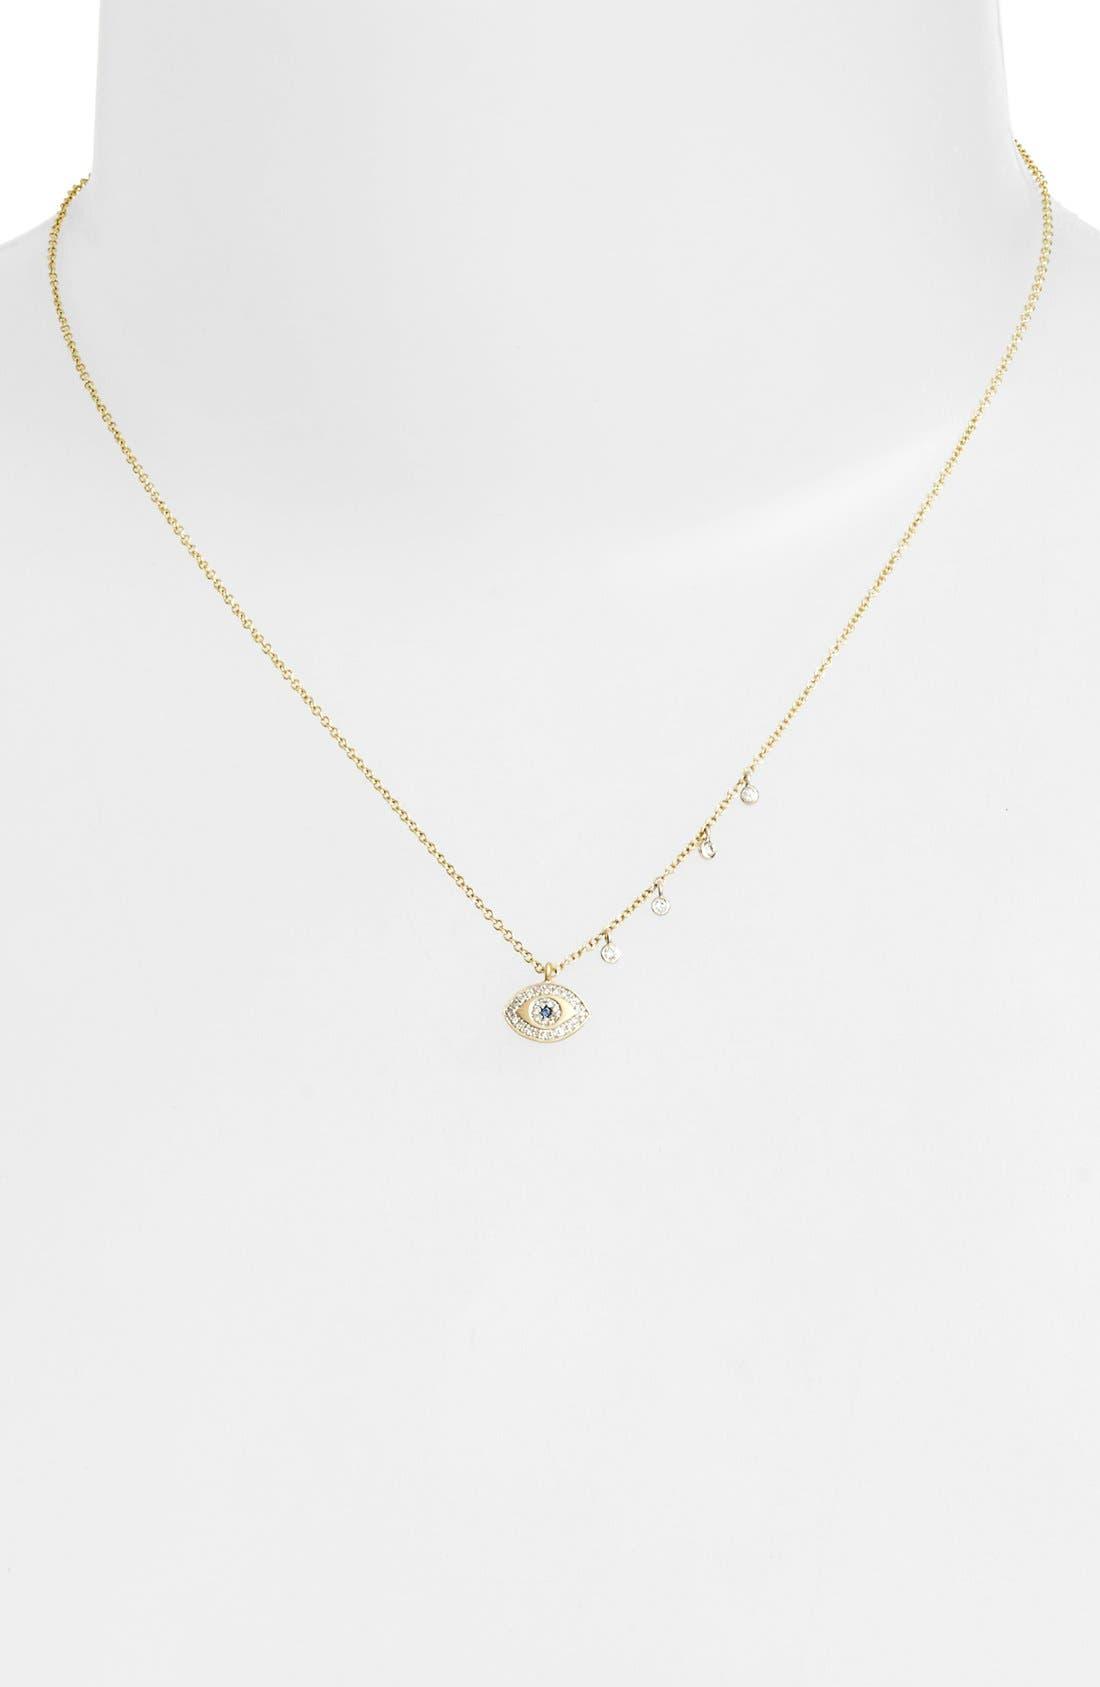 MEIRA T, Evil Eye Diamond Pendant Necklace, Alternate thumbnail 2, color, YELLOW GOLD